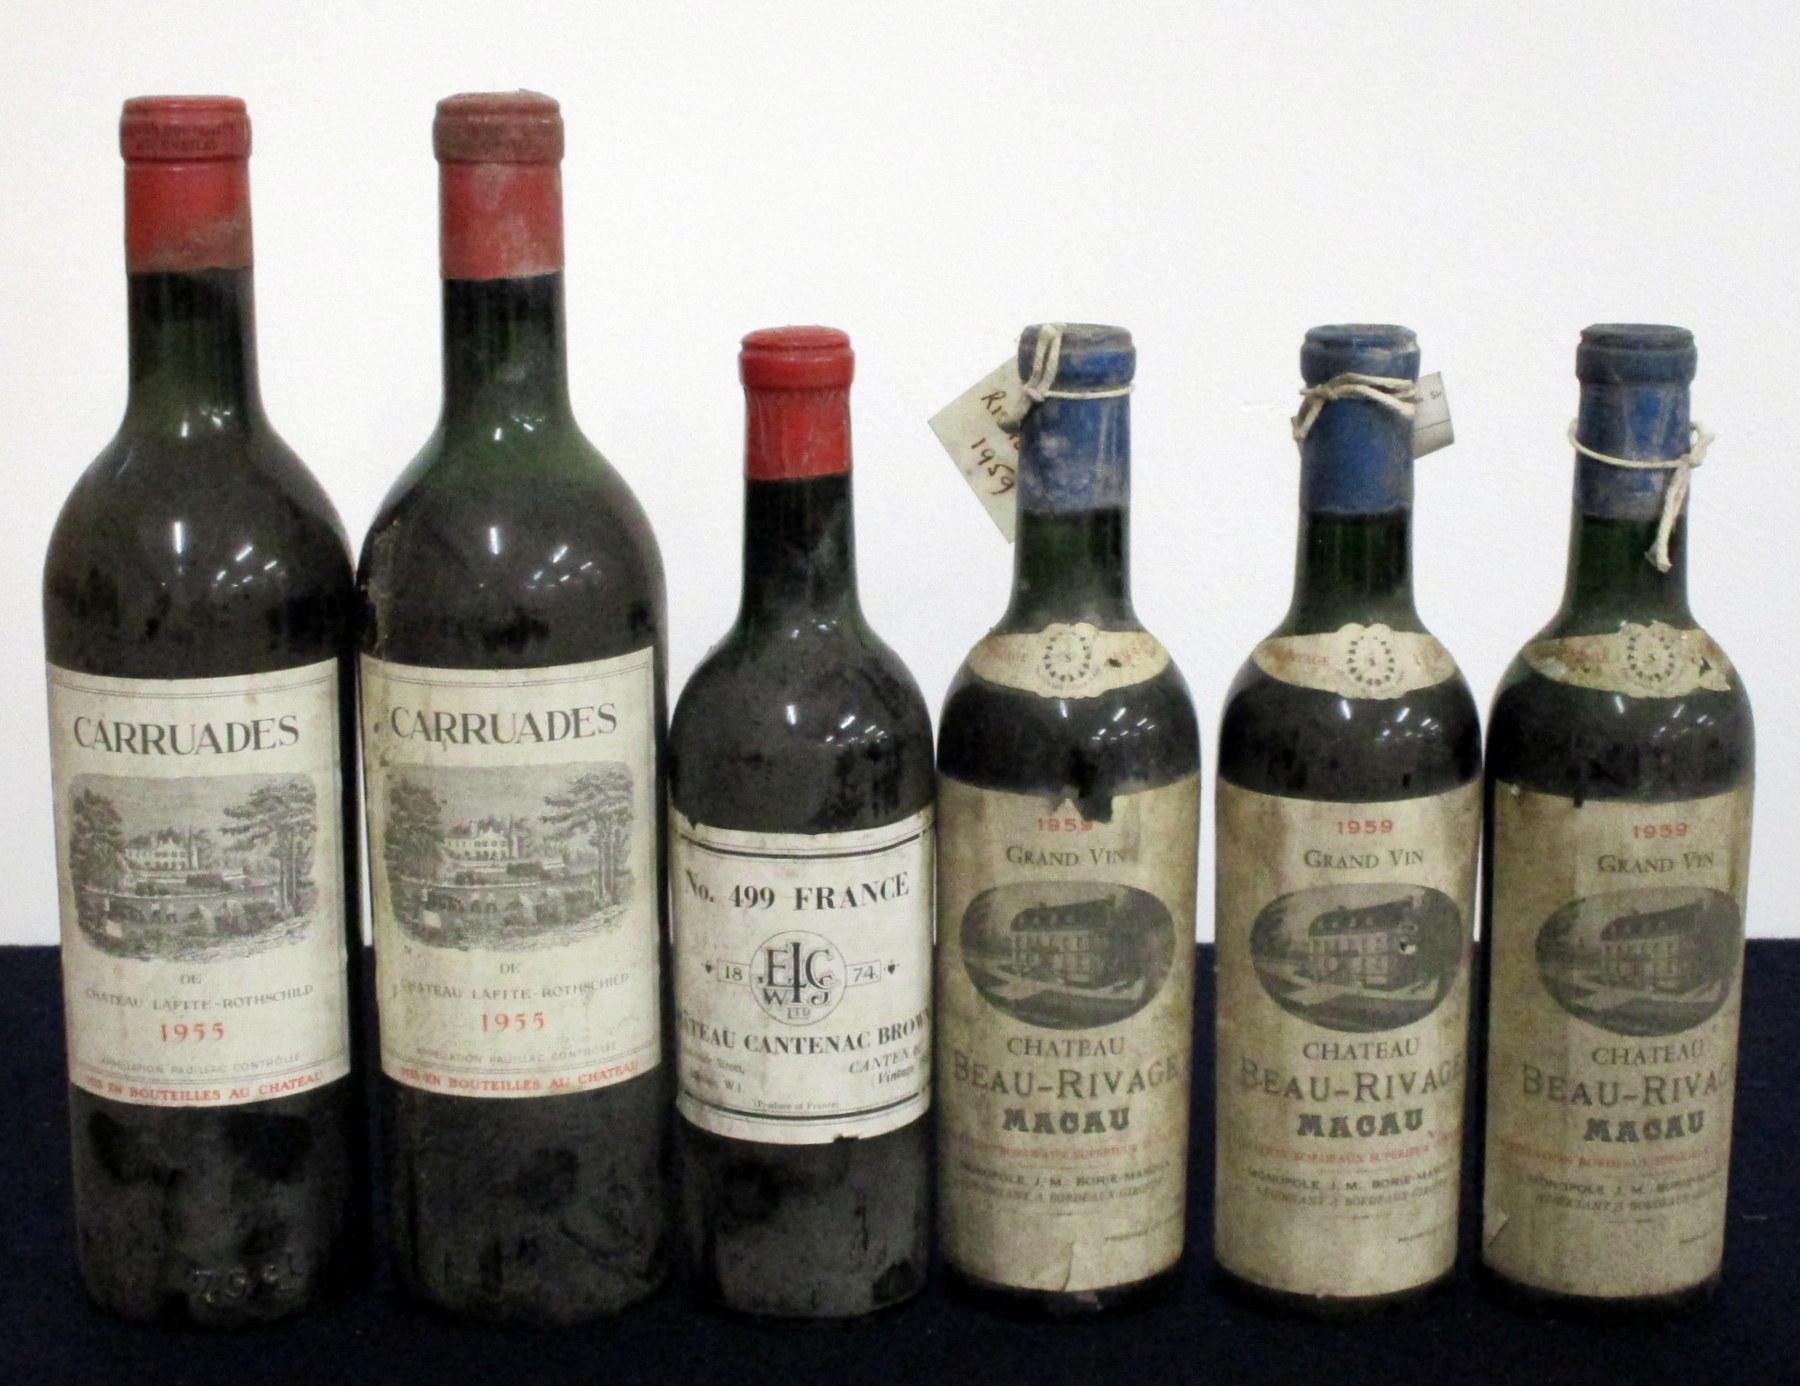 2 bts Carruades de Ch. Lafite Rothschild 1955 Pauillac ts, lms/ms, bs 1 hf bt Ch. Cantenac Brown